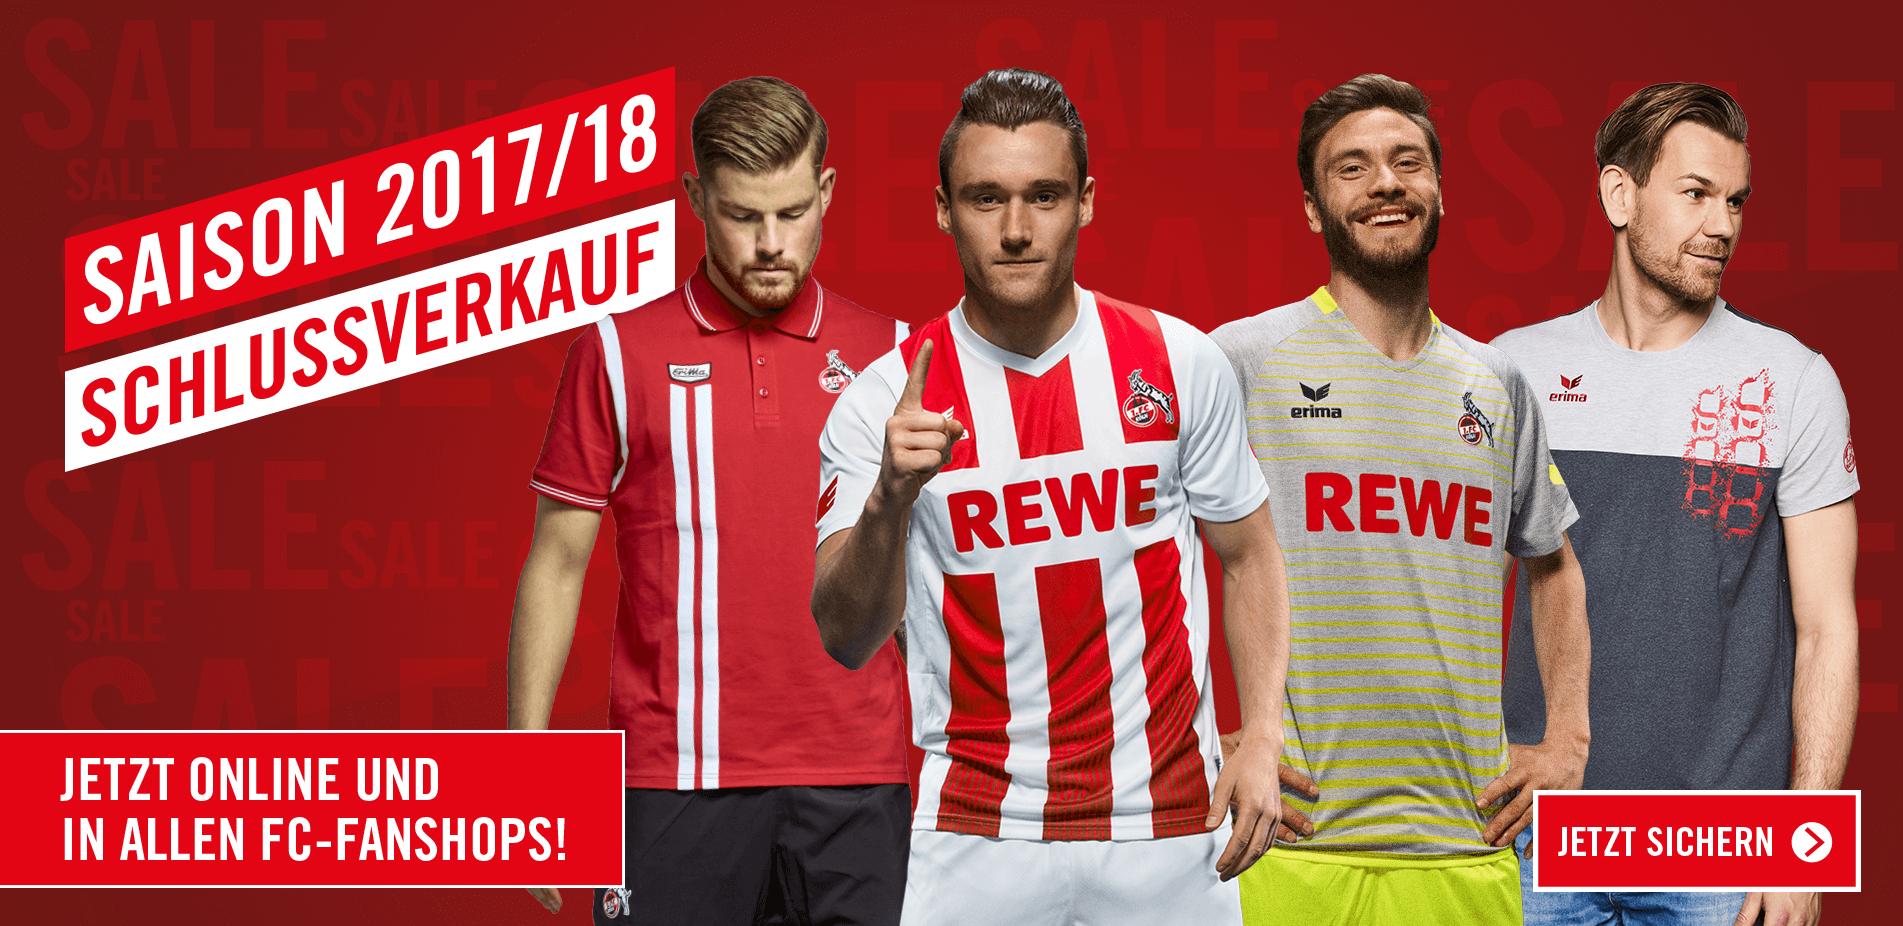 1.FC Köln - Erima Sale 2017/18 z.B. Heimtrikot 2017/18 (S,M) 24,95€